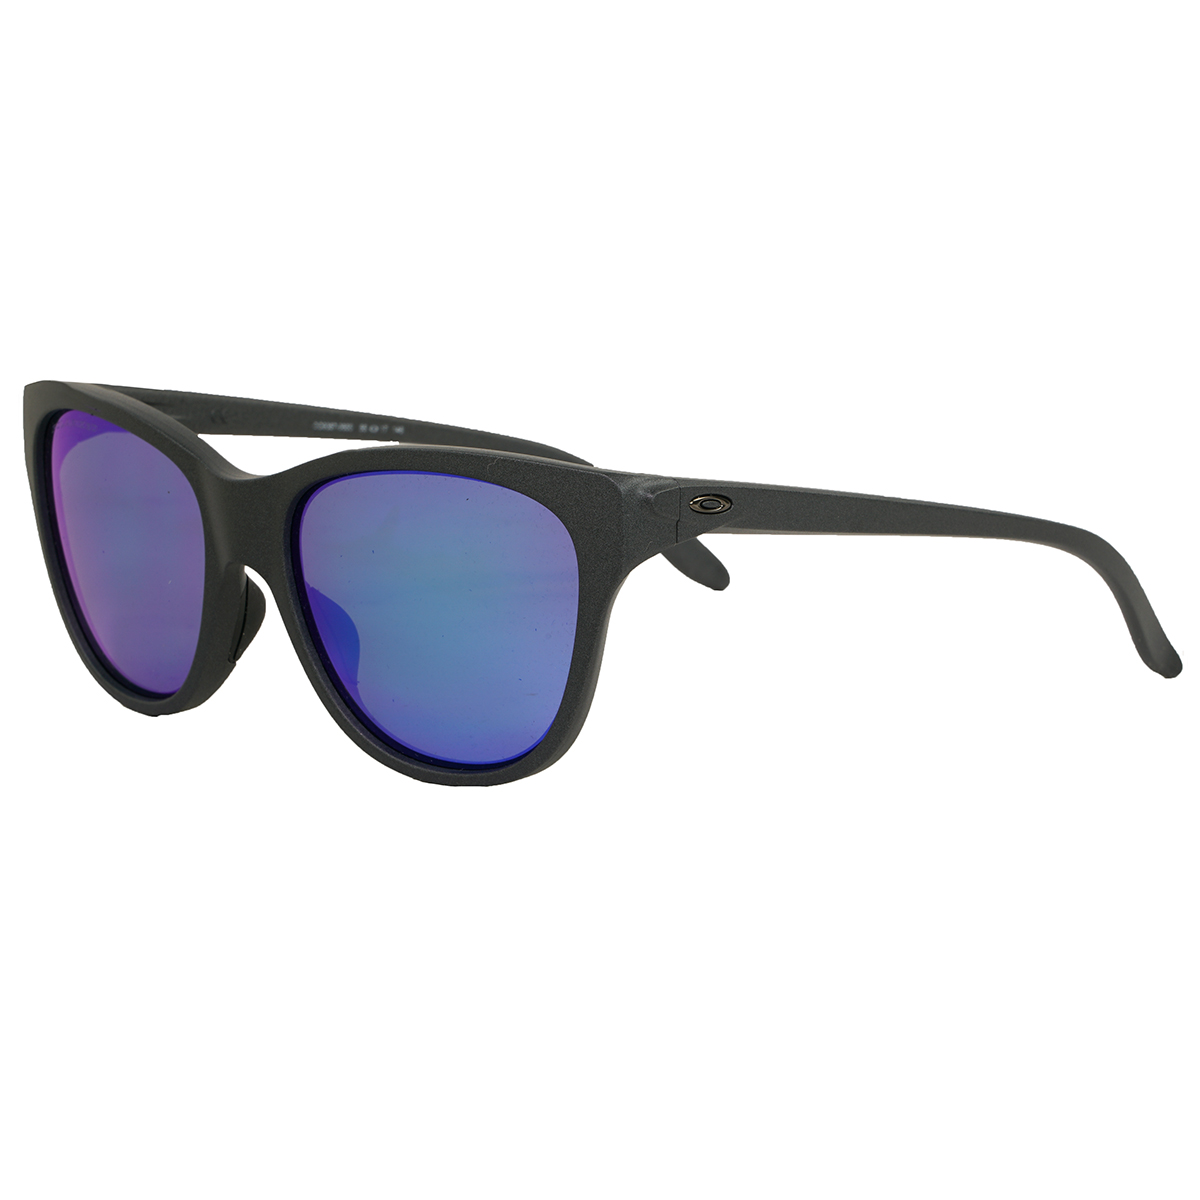 5755de755e8 Oakley Hold Out Sunglasses Steel Sapphire Iridium Polarized